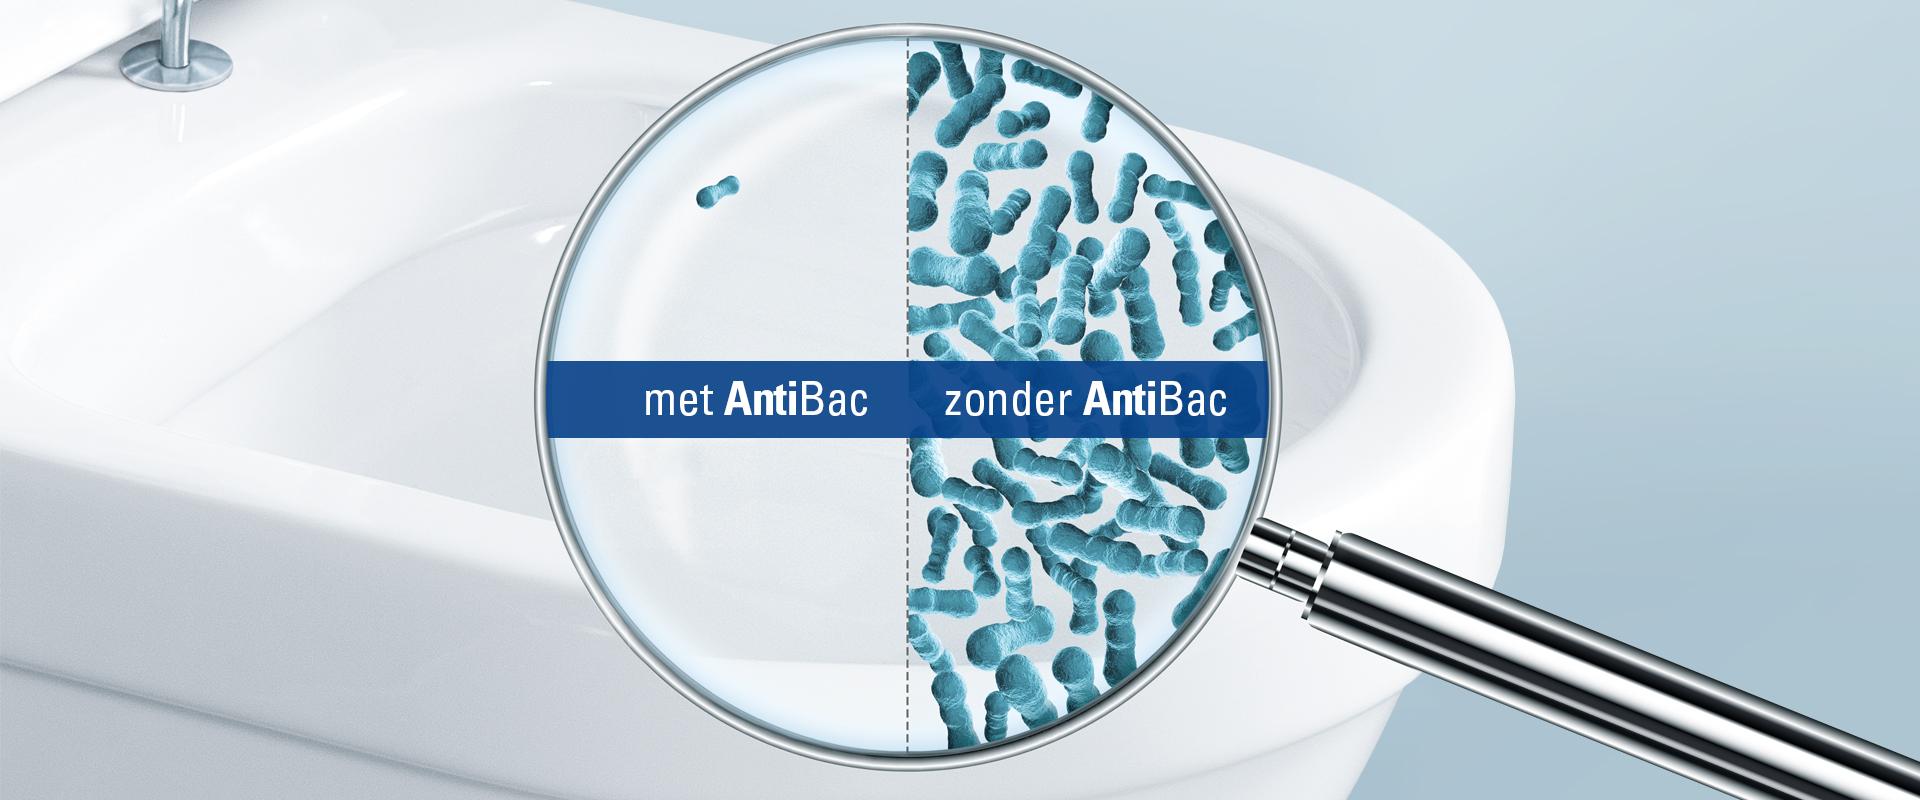 https://www.villeroy-boch.be/fileadmin/upload/facelift2014/Bad_und_Wellness/Unser_Versprechen/Innovation/AntiBac/antibac-header-NL.png